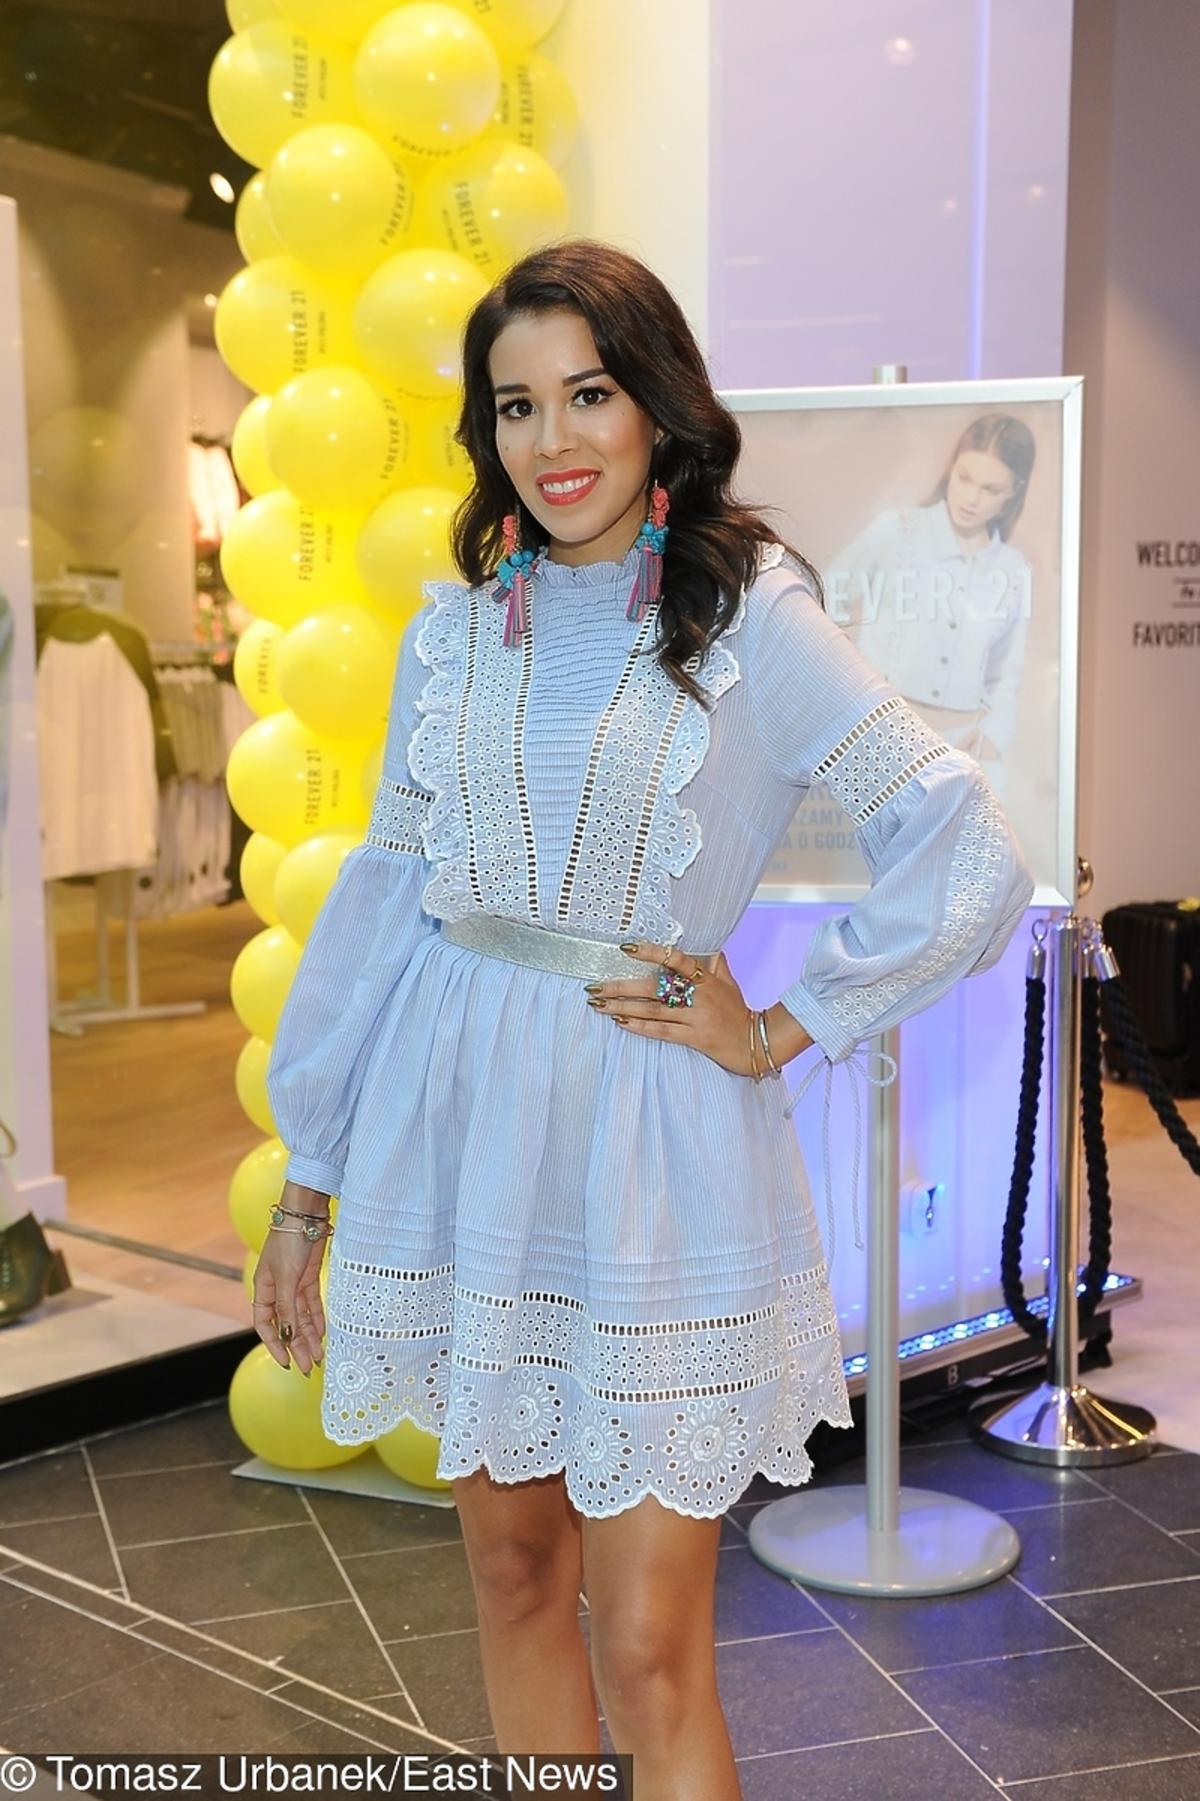 Macademian Girl na otwarciu sklepu w Arkadii